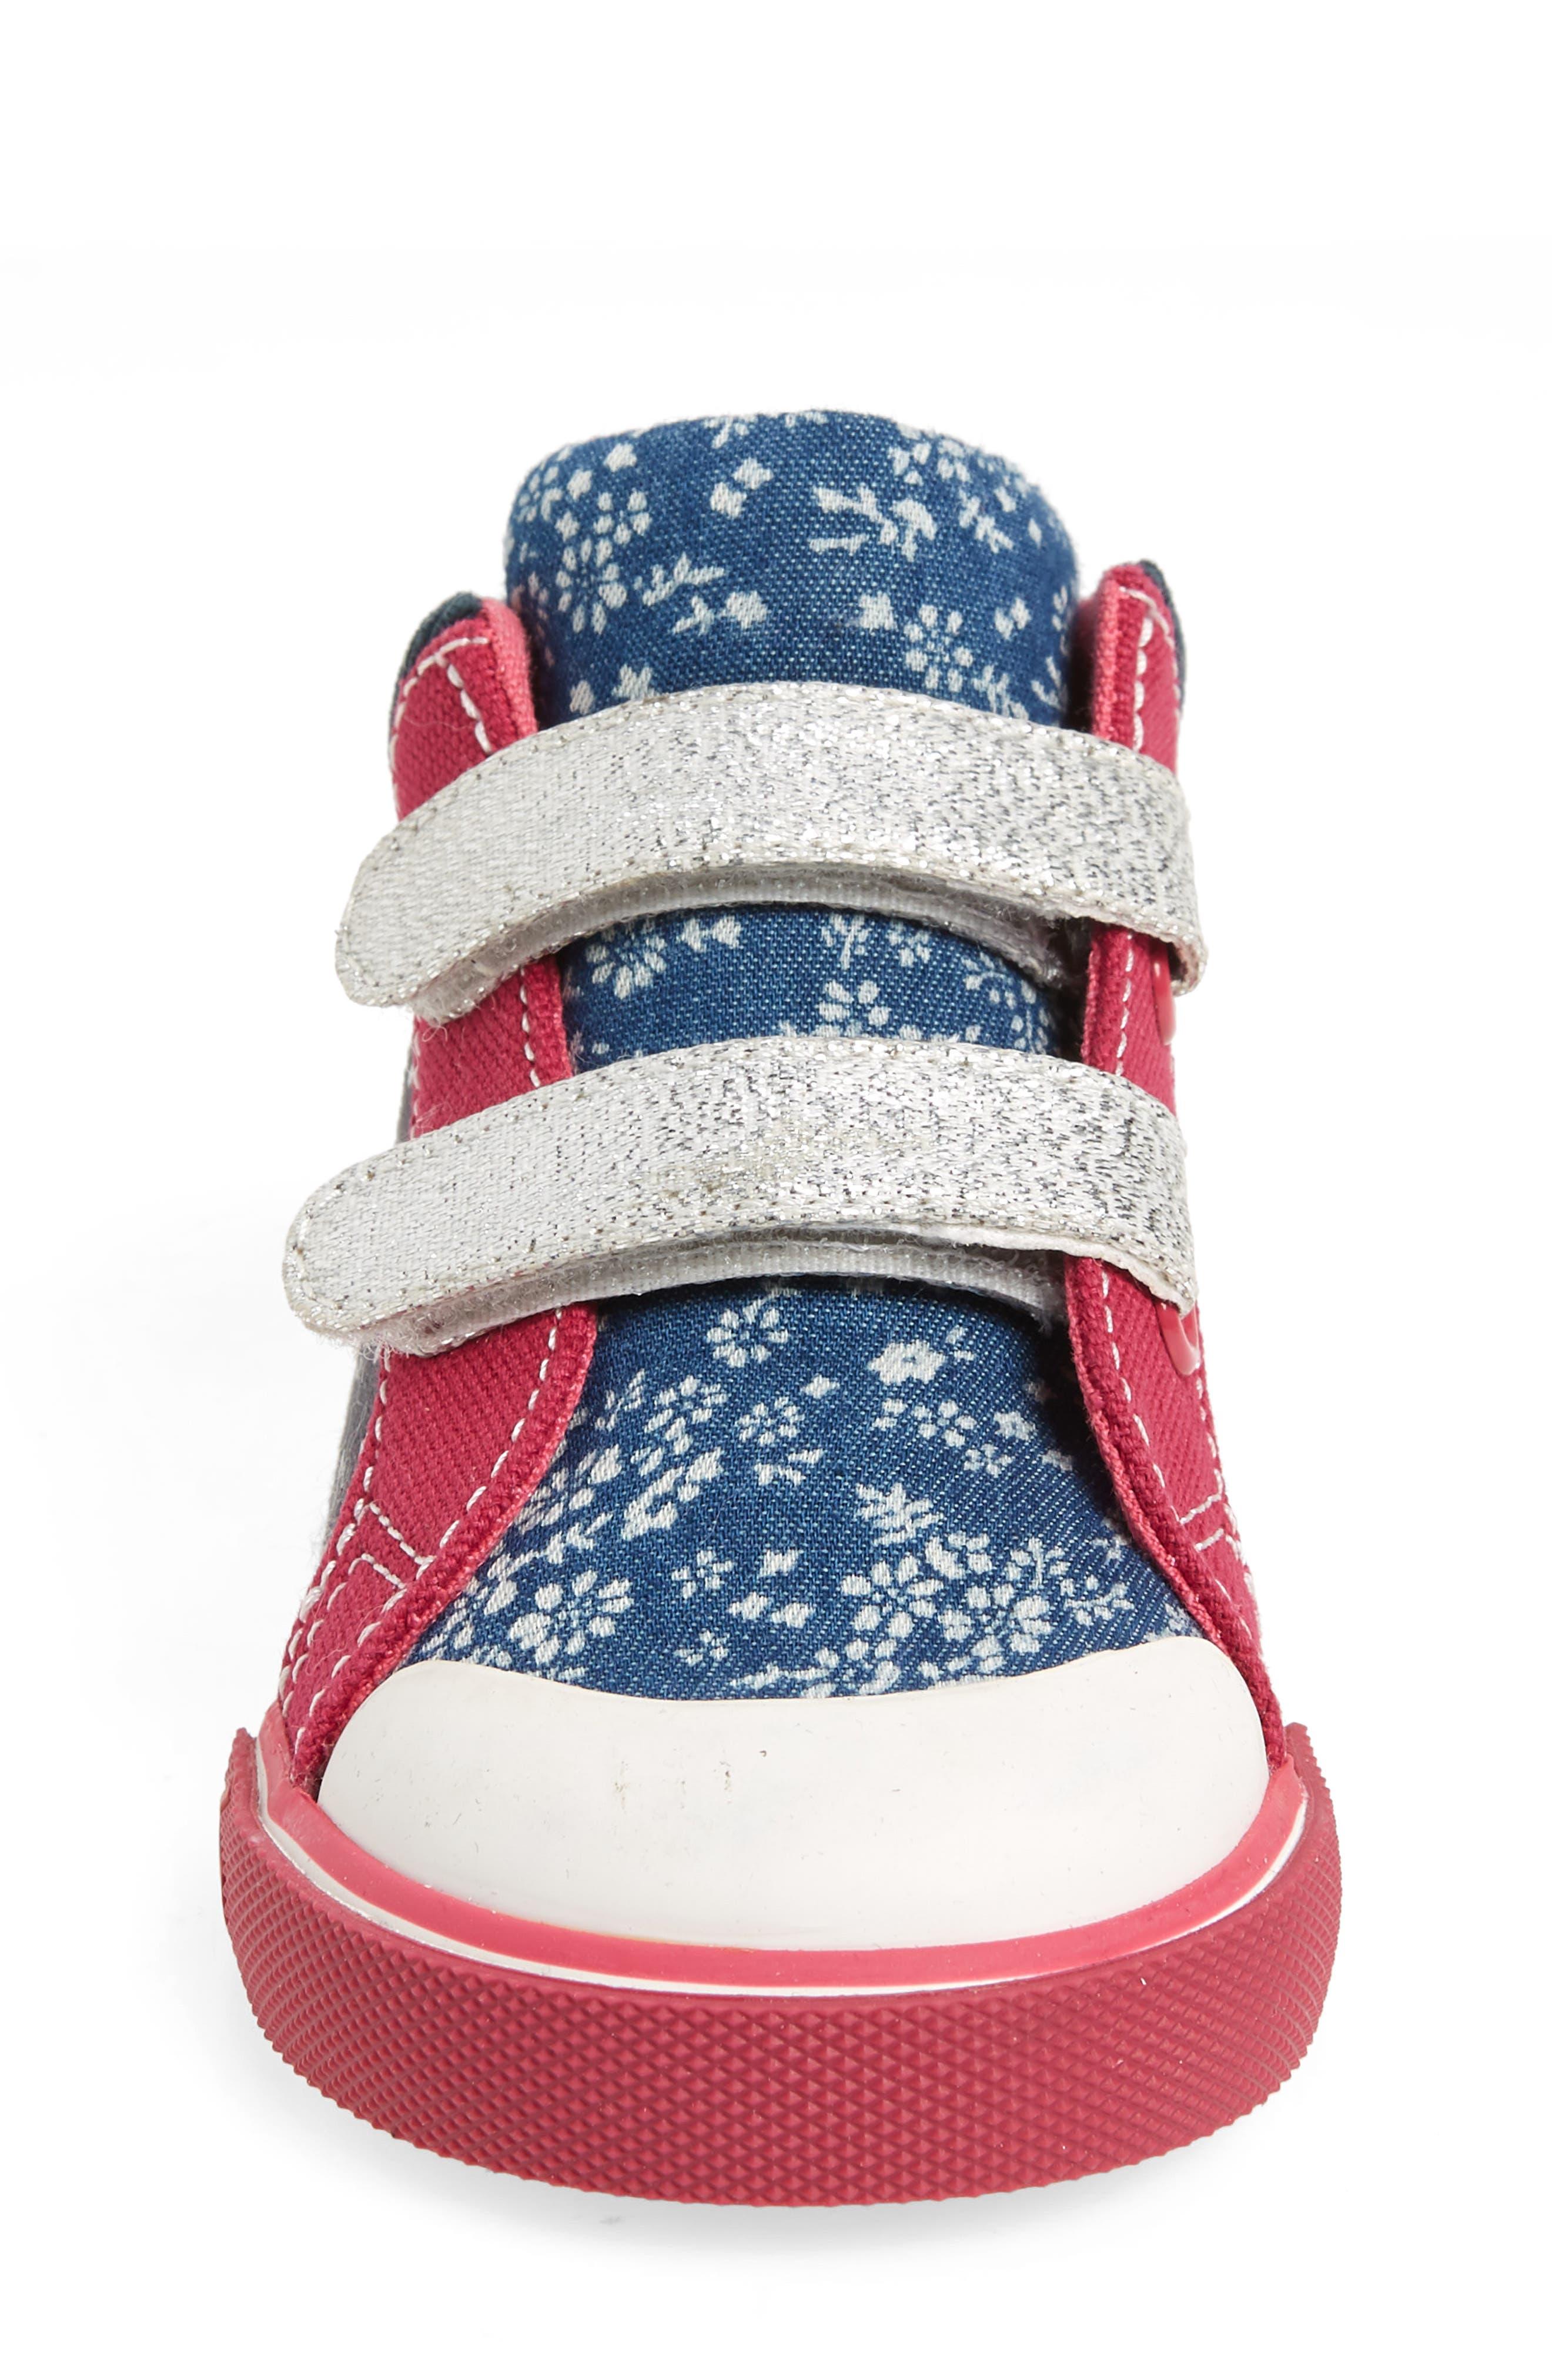 Kya Sneaker,                             Alternate thumbnail 4, color,                             Navy Corduroy/ Multi